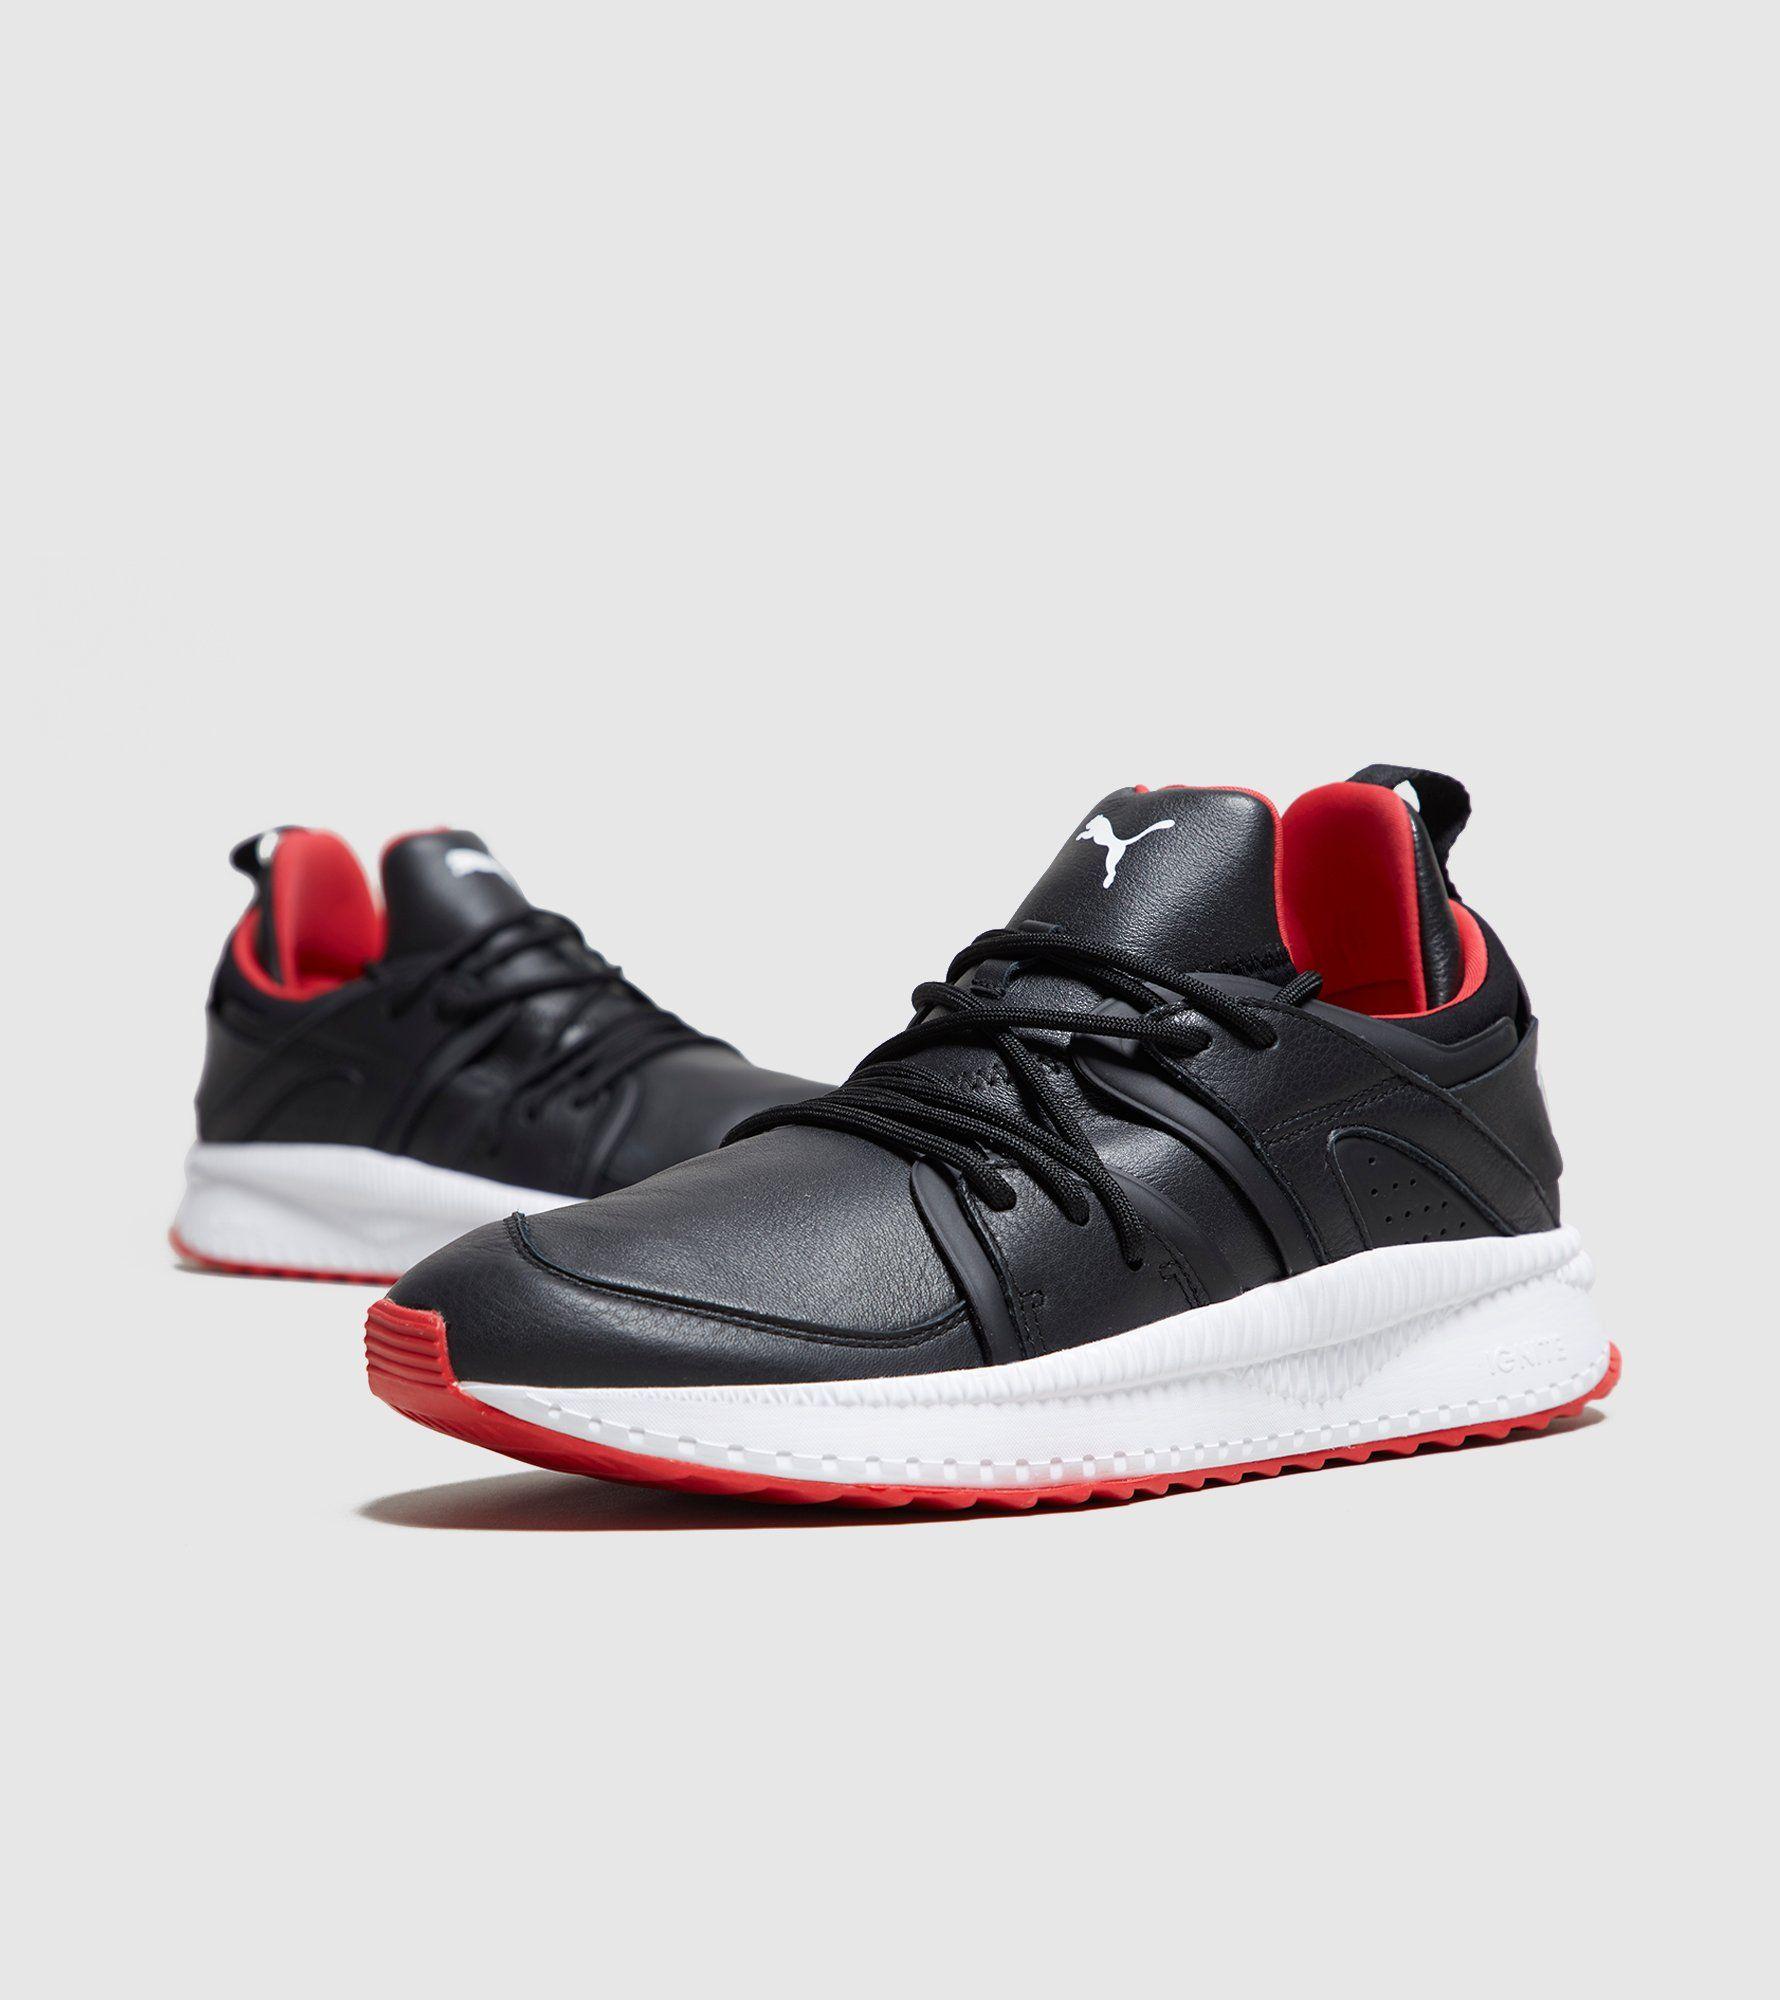 Puma X Trapstar Tsugi Blaze sneakers